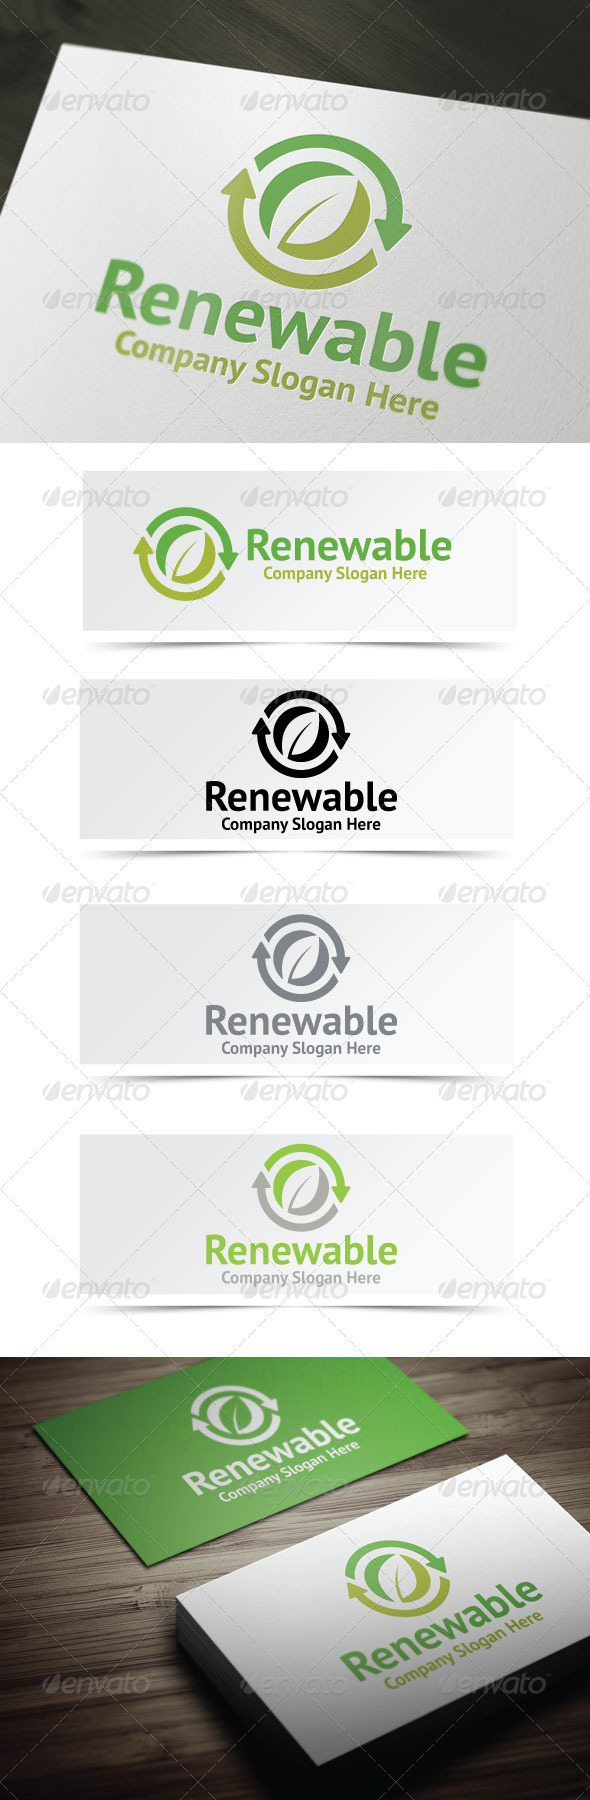 Renewable Resources Logo - Nature Logo Templates